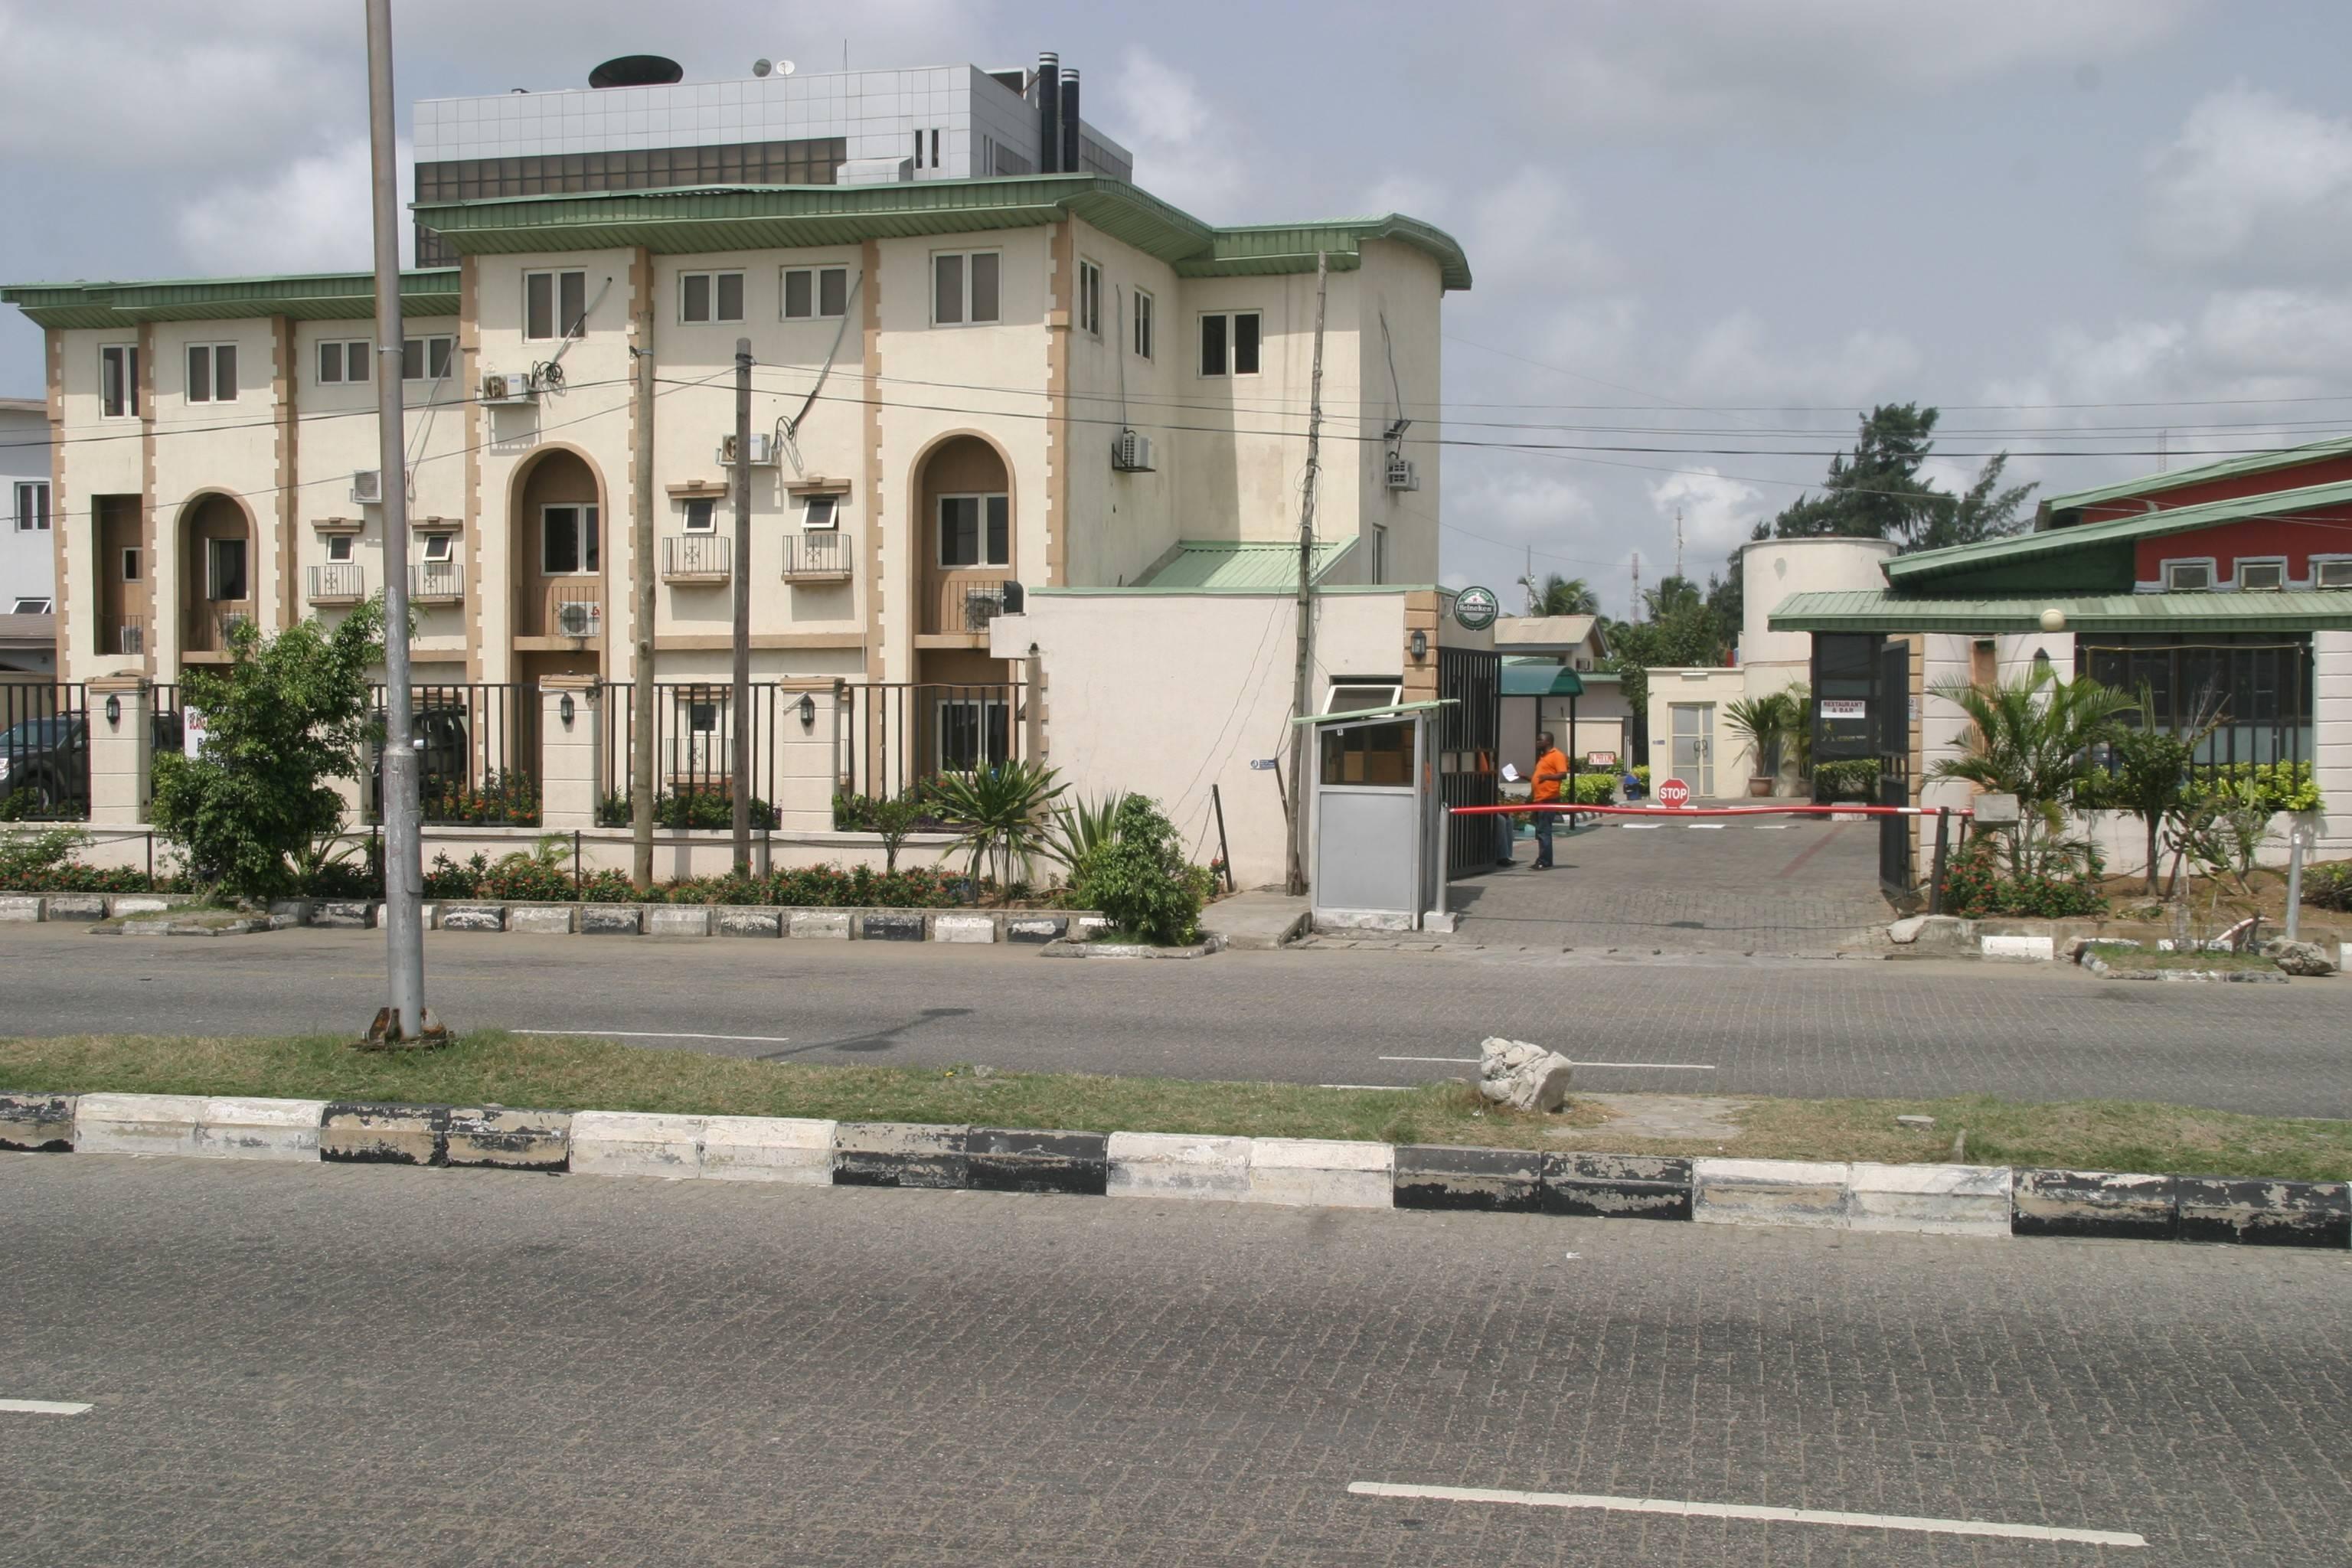 Michael Restaurants Nigeria Limited